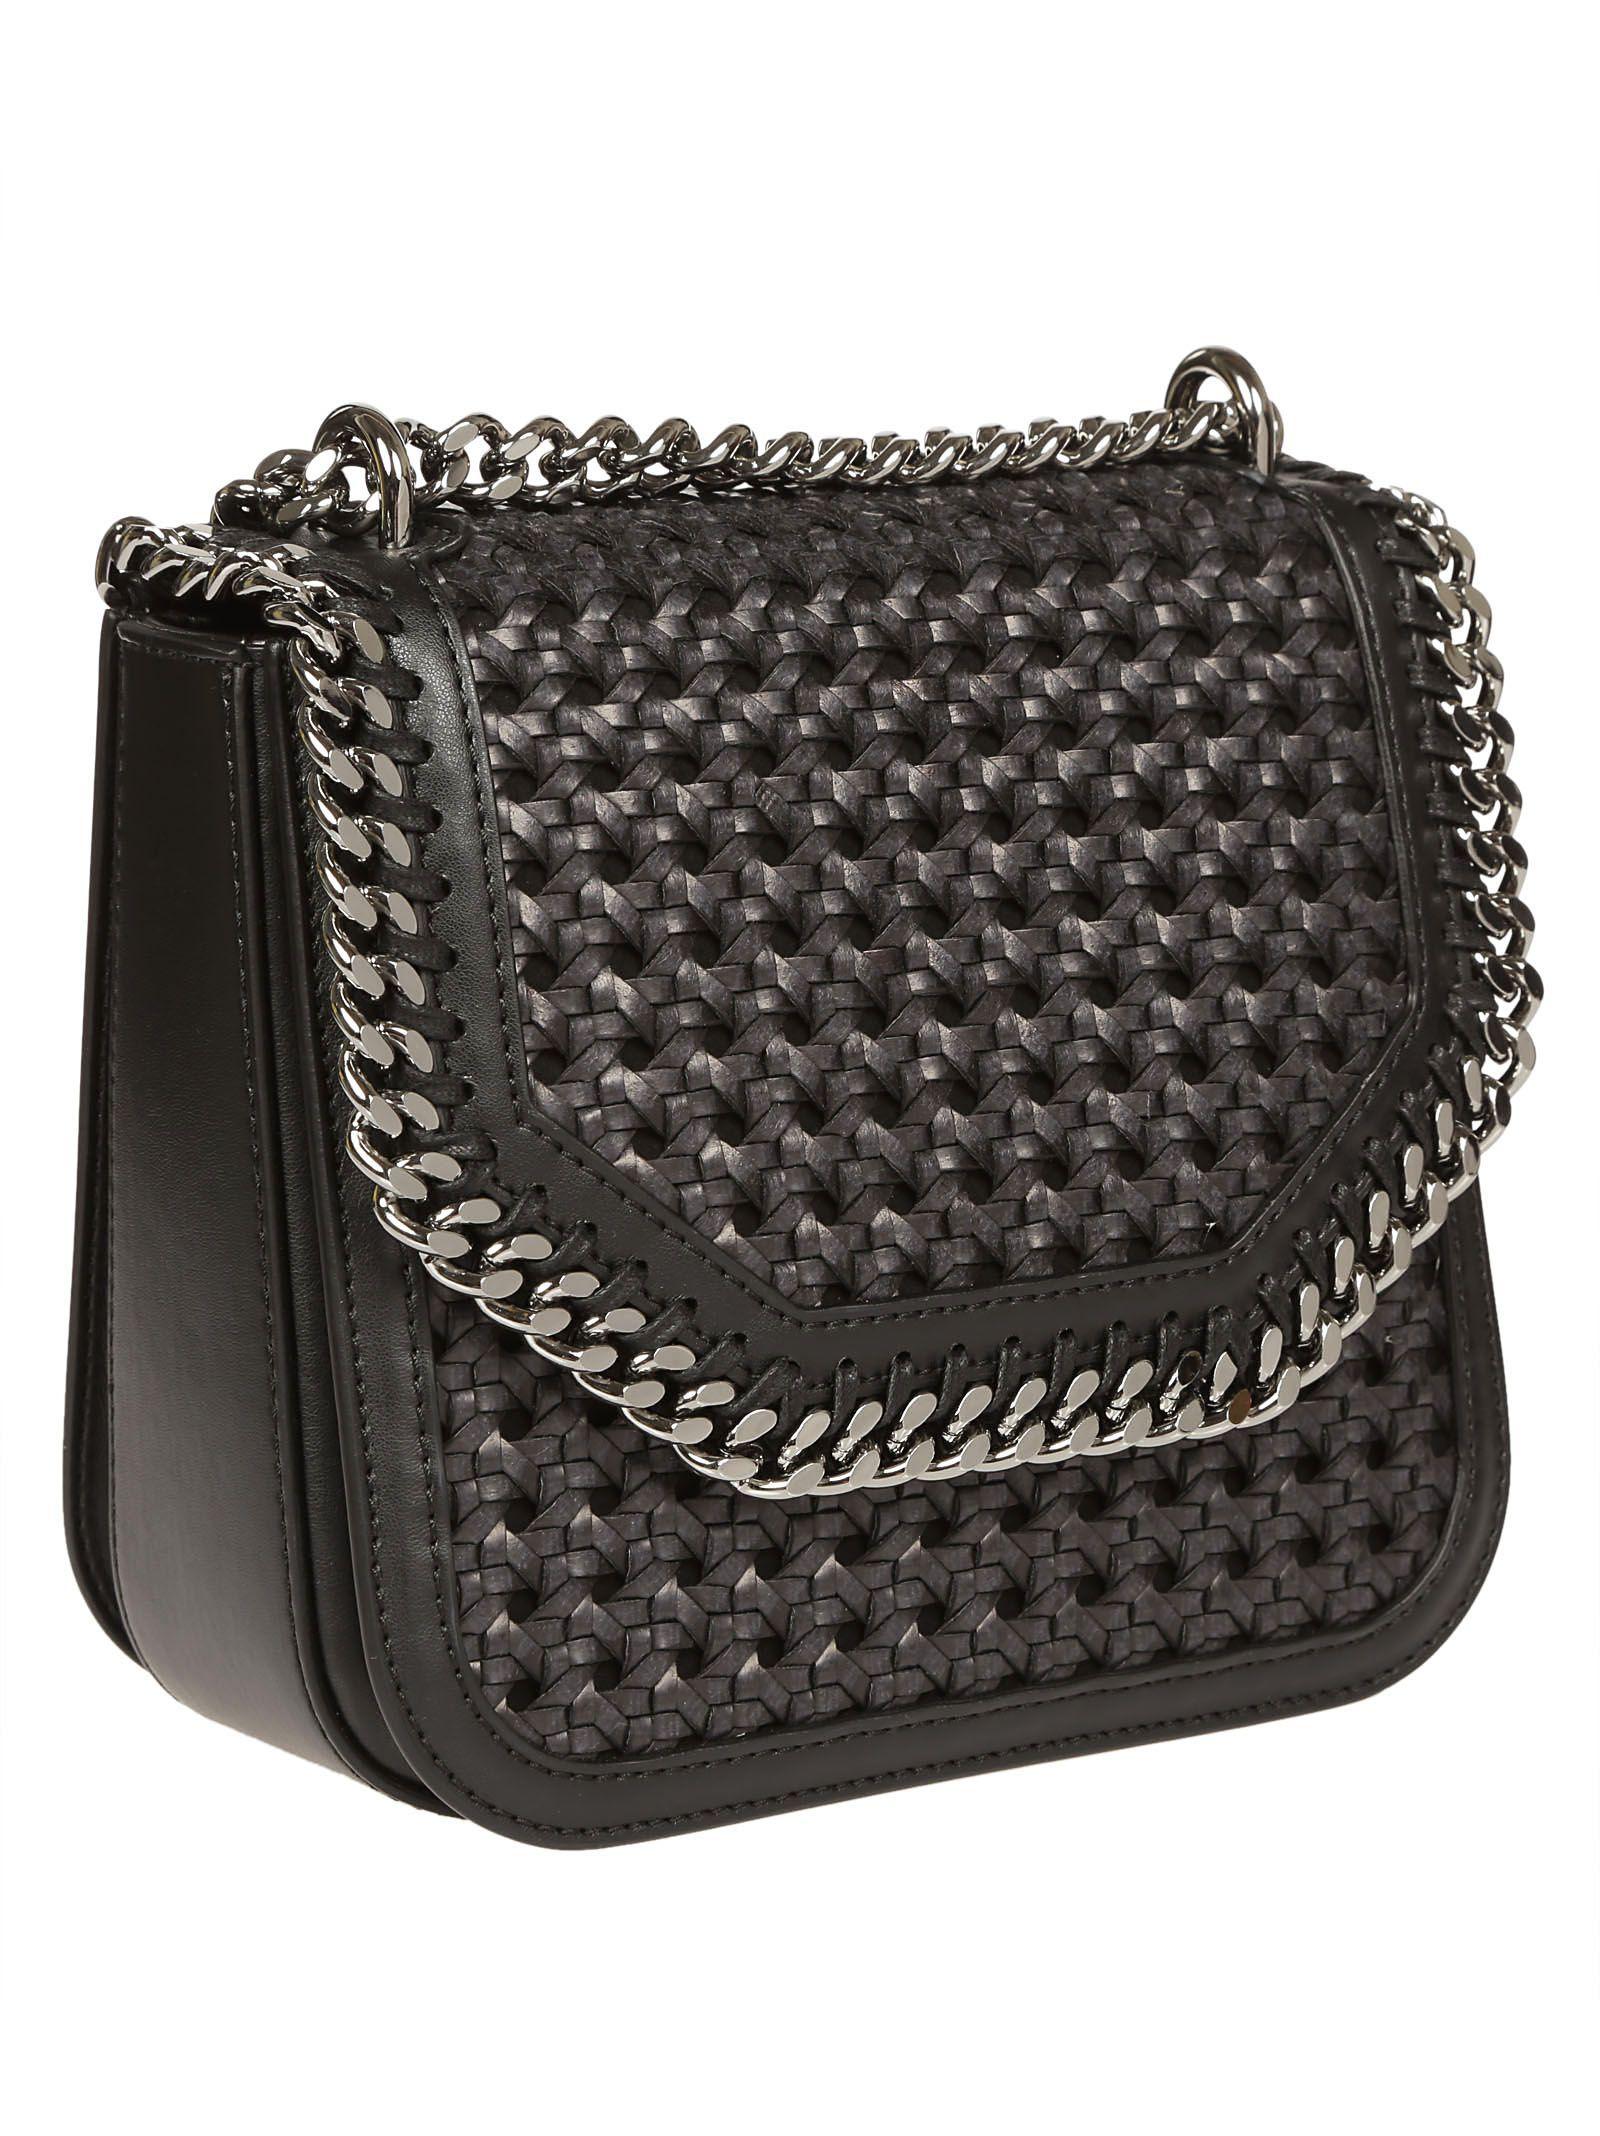 39f7f4cf76a3 Falabella Box Wicker Medium Shoulder Bag from Stella McCartney  Black  Falabella Box Wicker Medium Shoulder